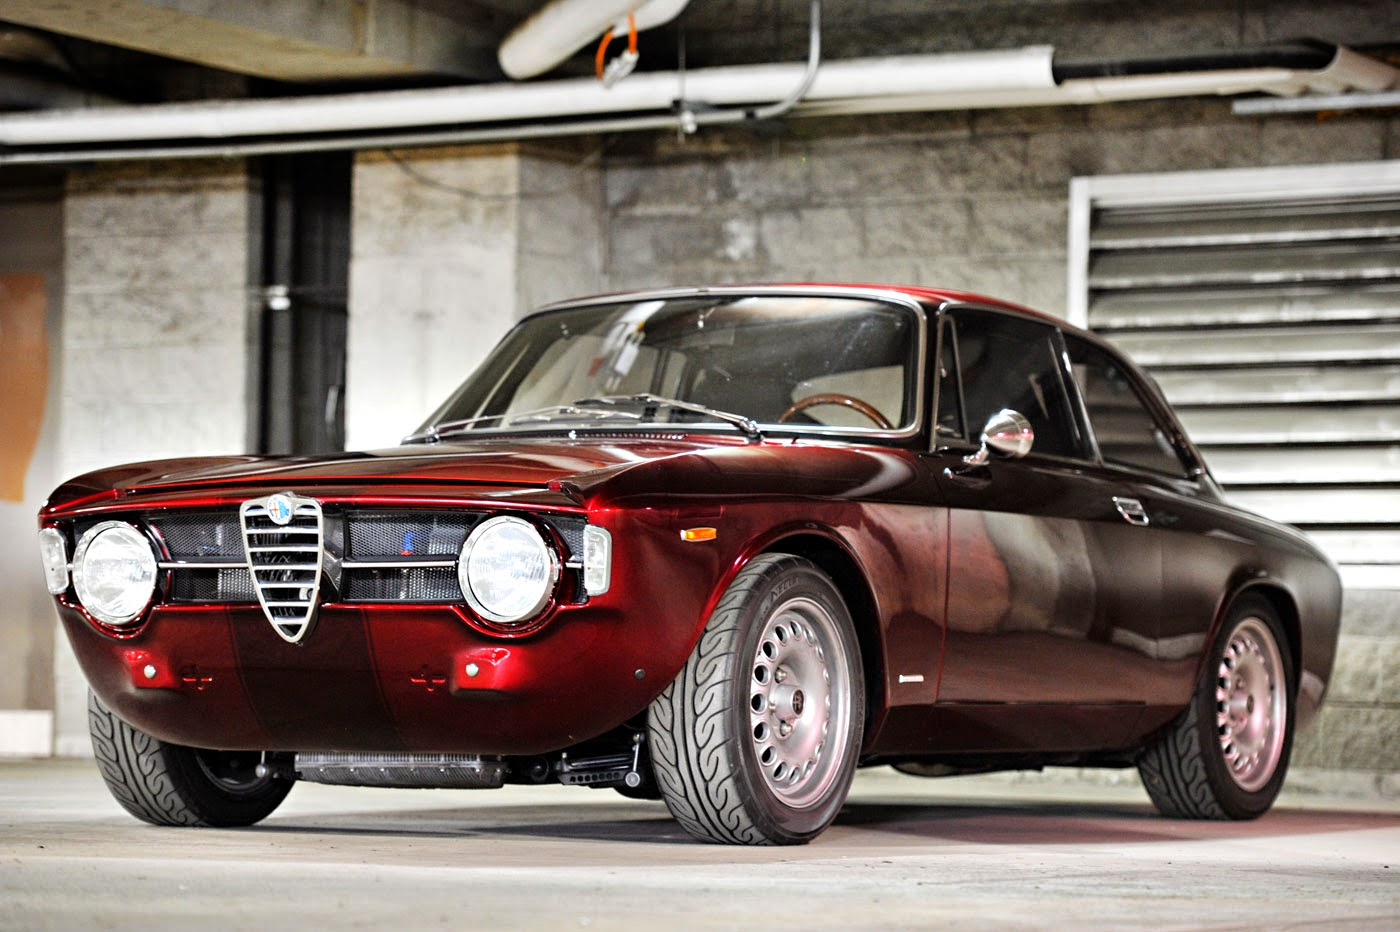 KarzNshit///: '69 Alfa Romeo GT 1300 junior